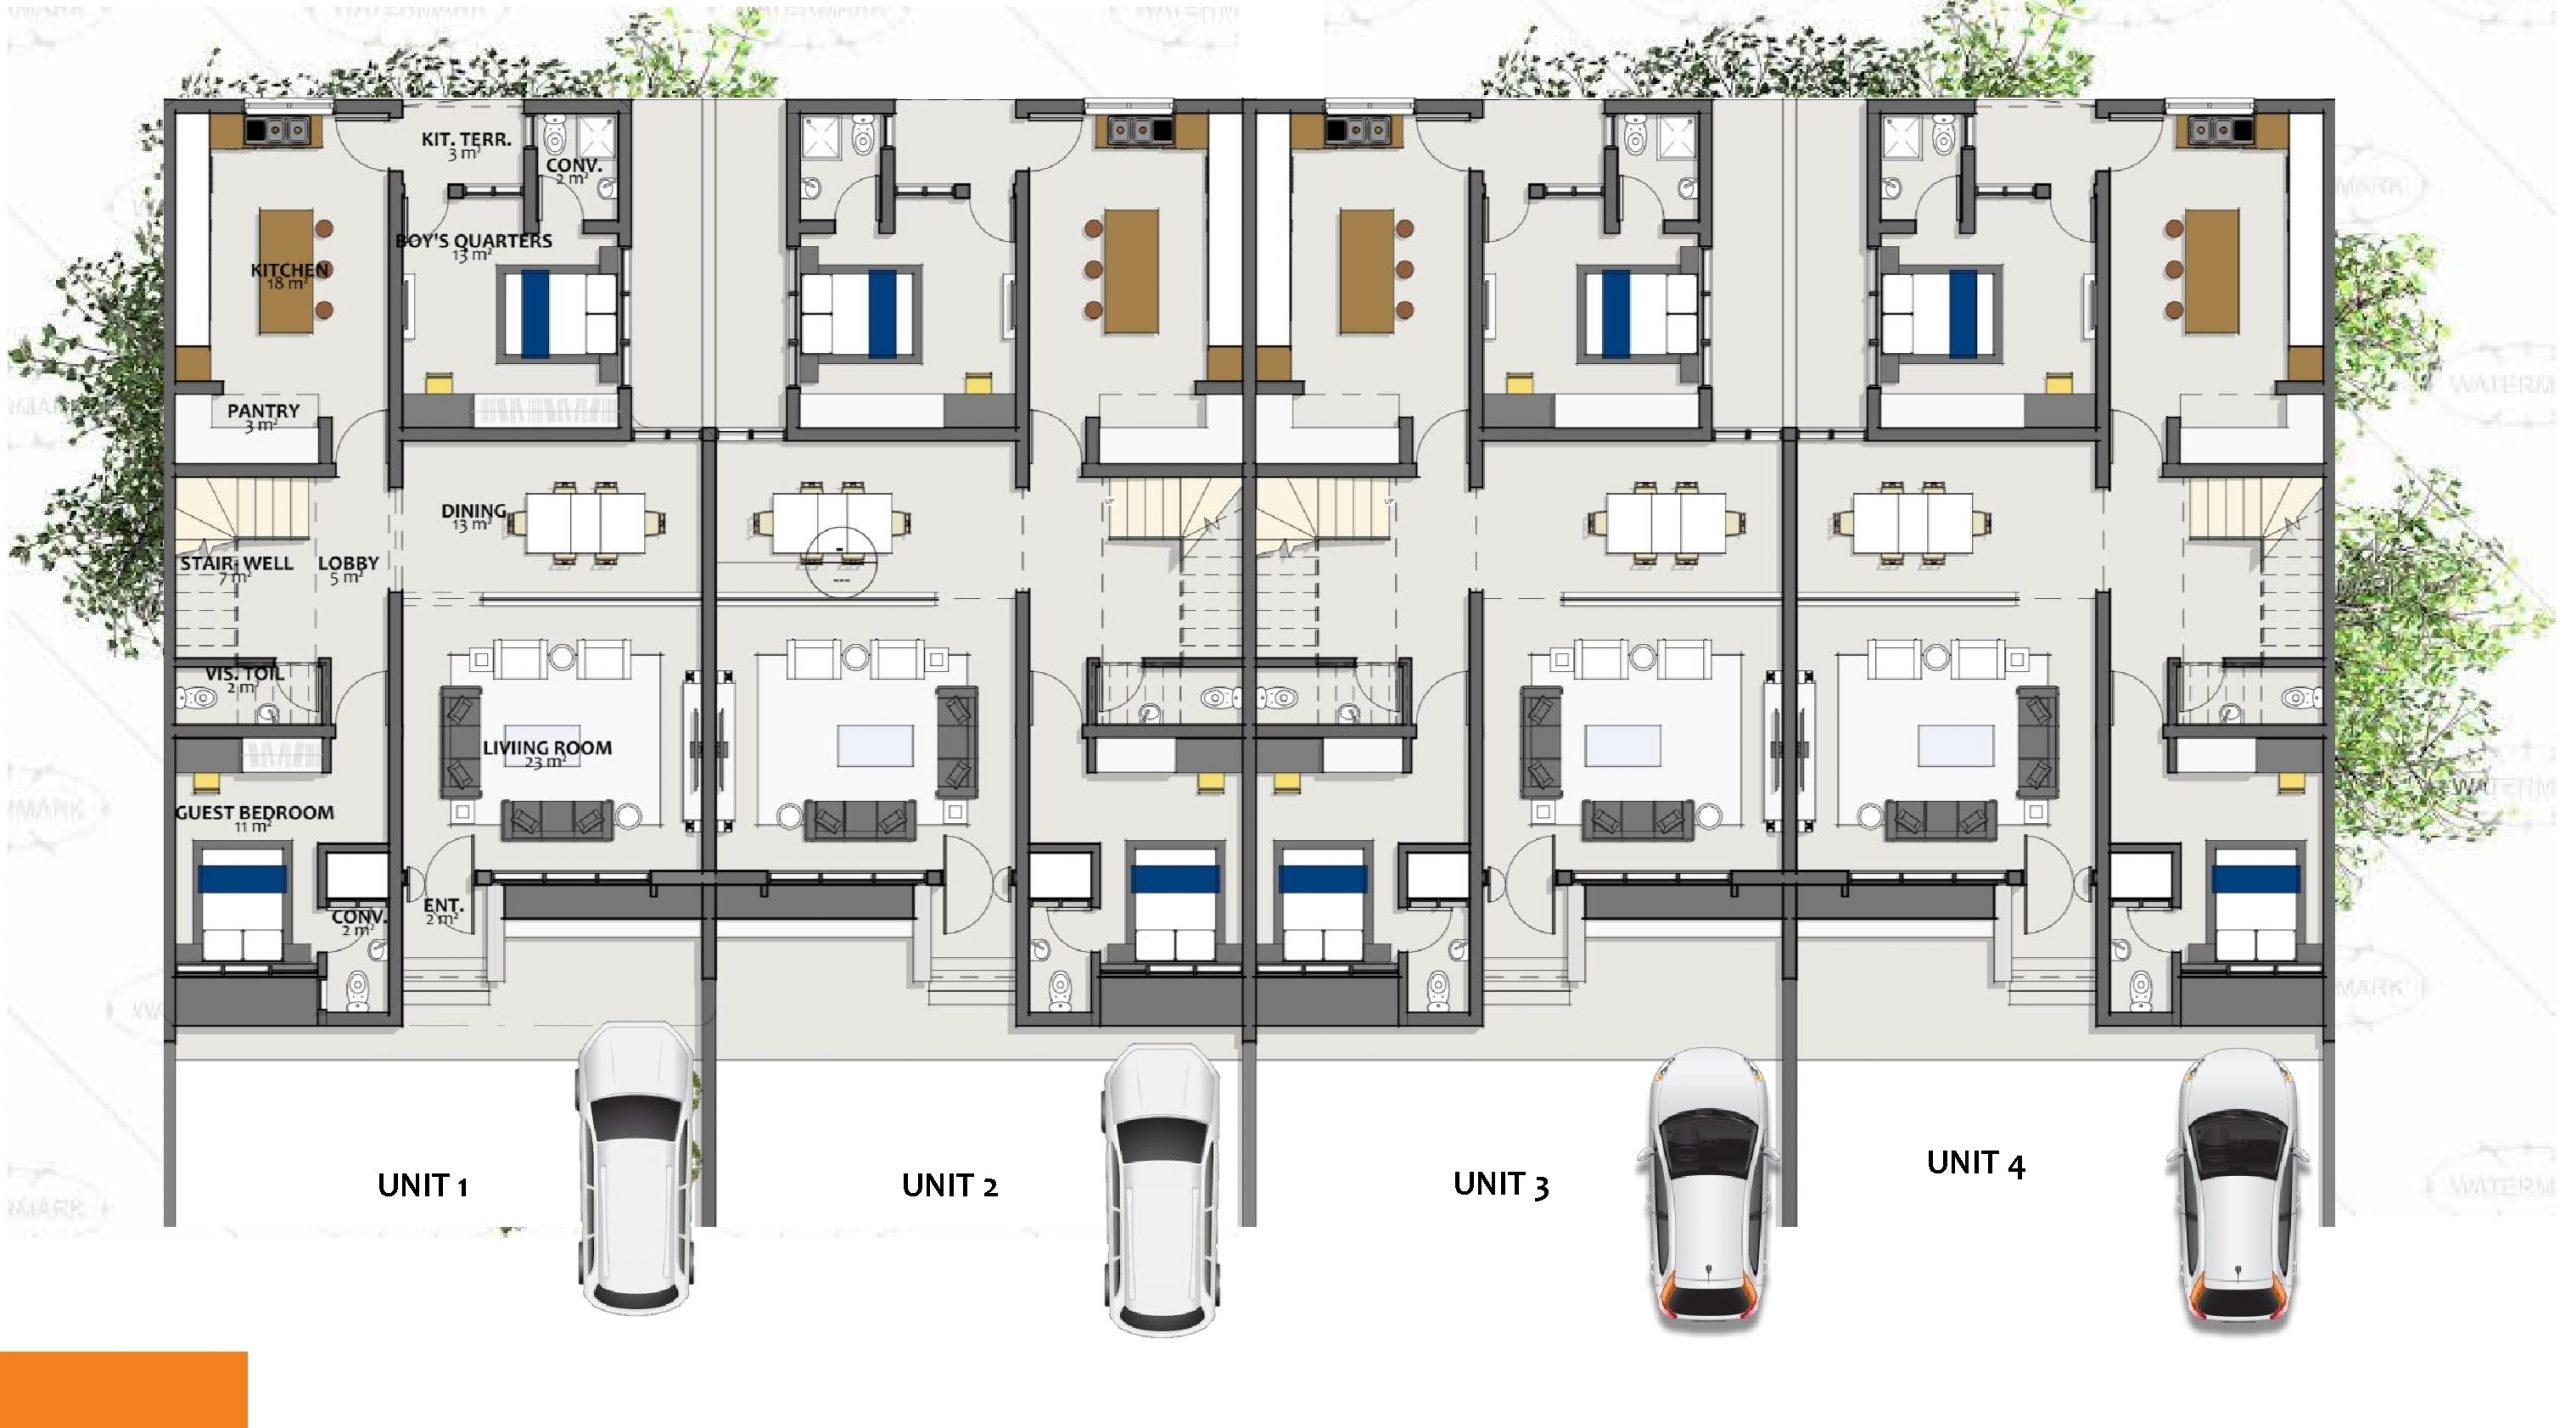 LIFESTYLE ASSET HUB - Extra Luxury Ground Floor